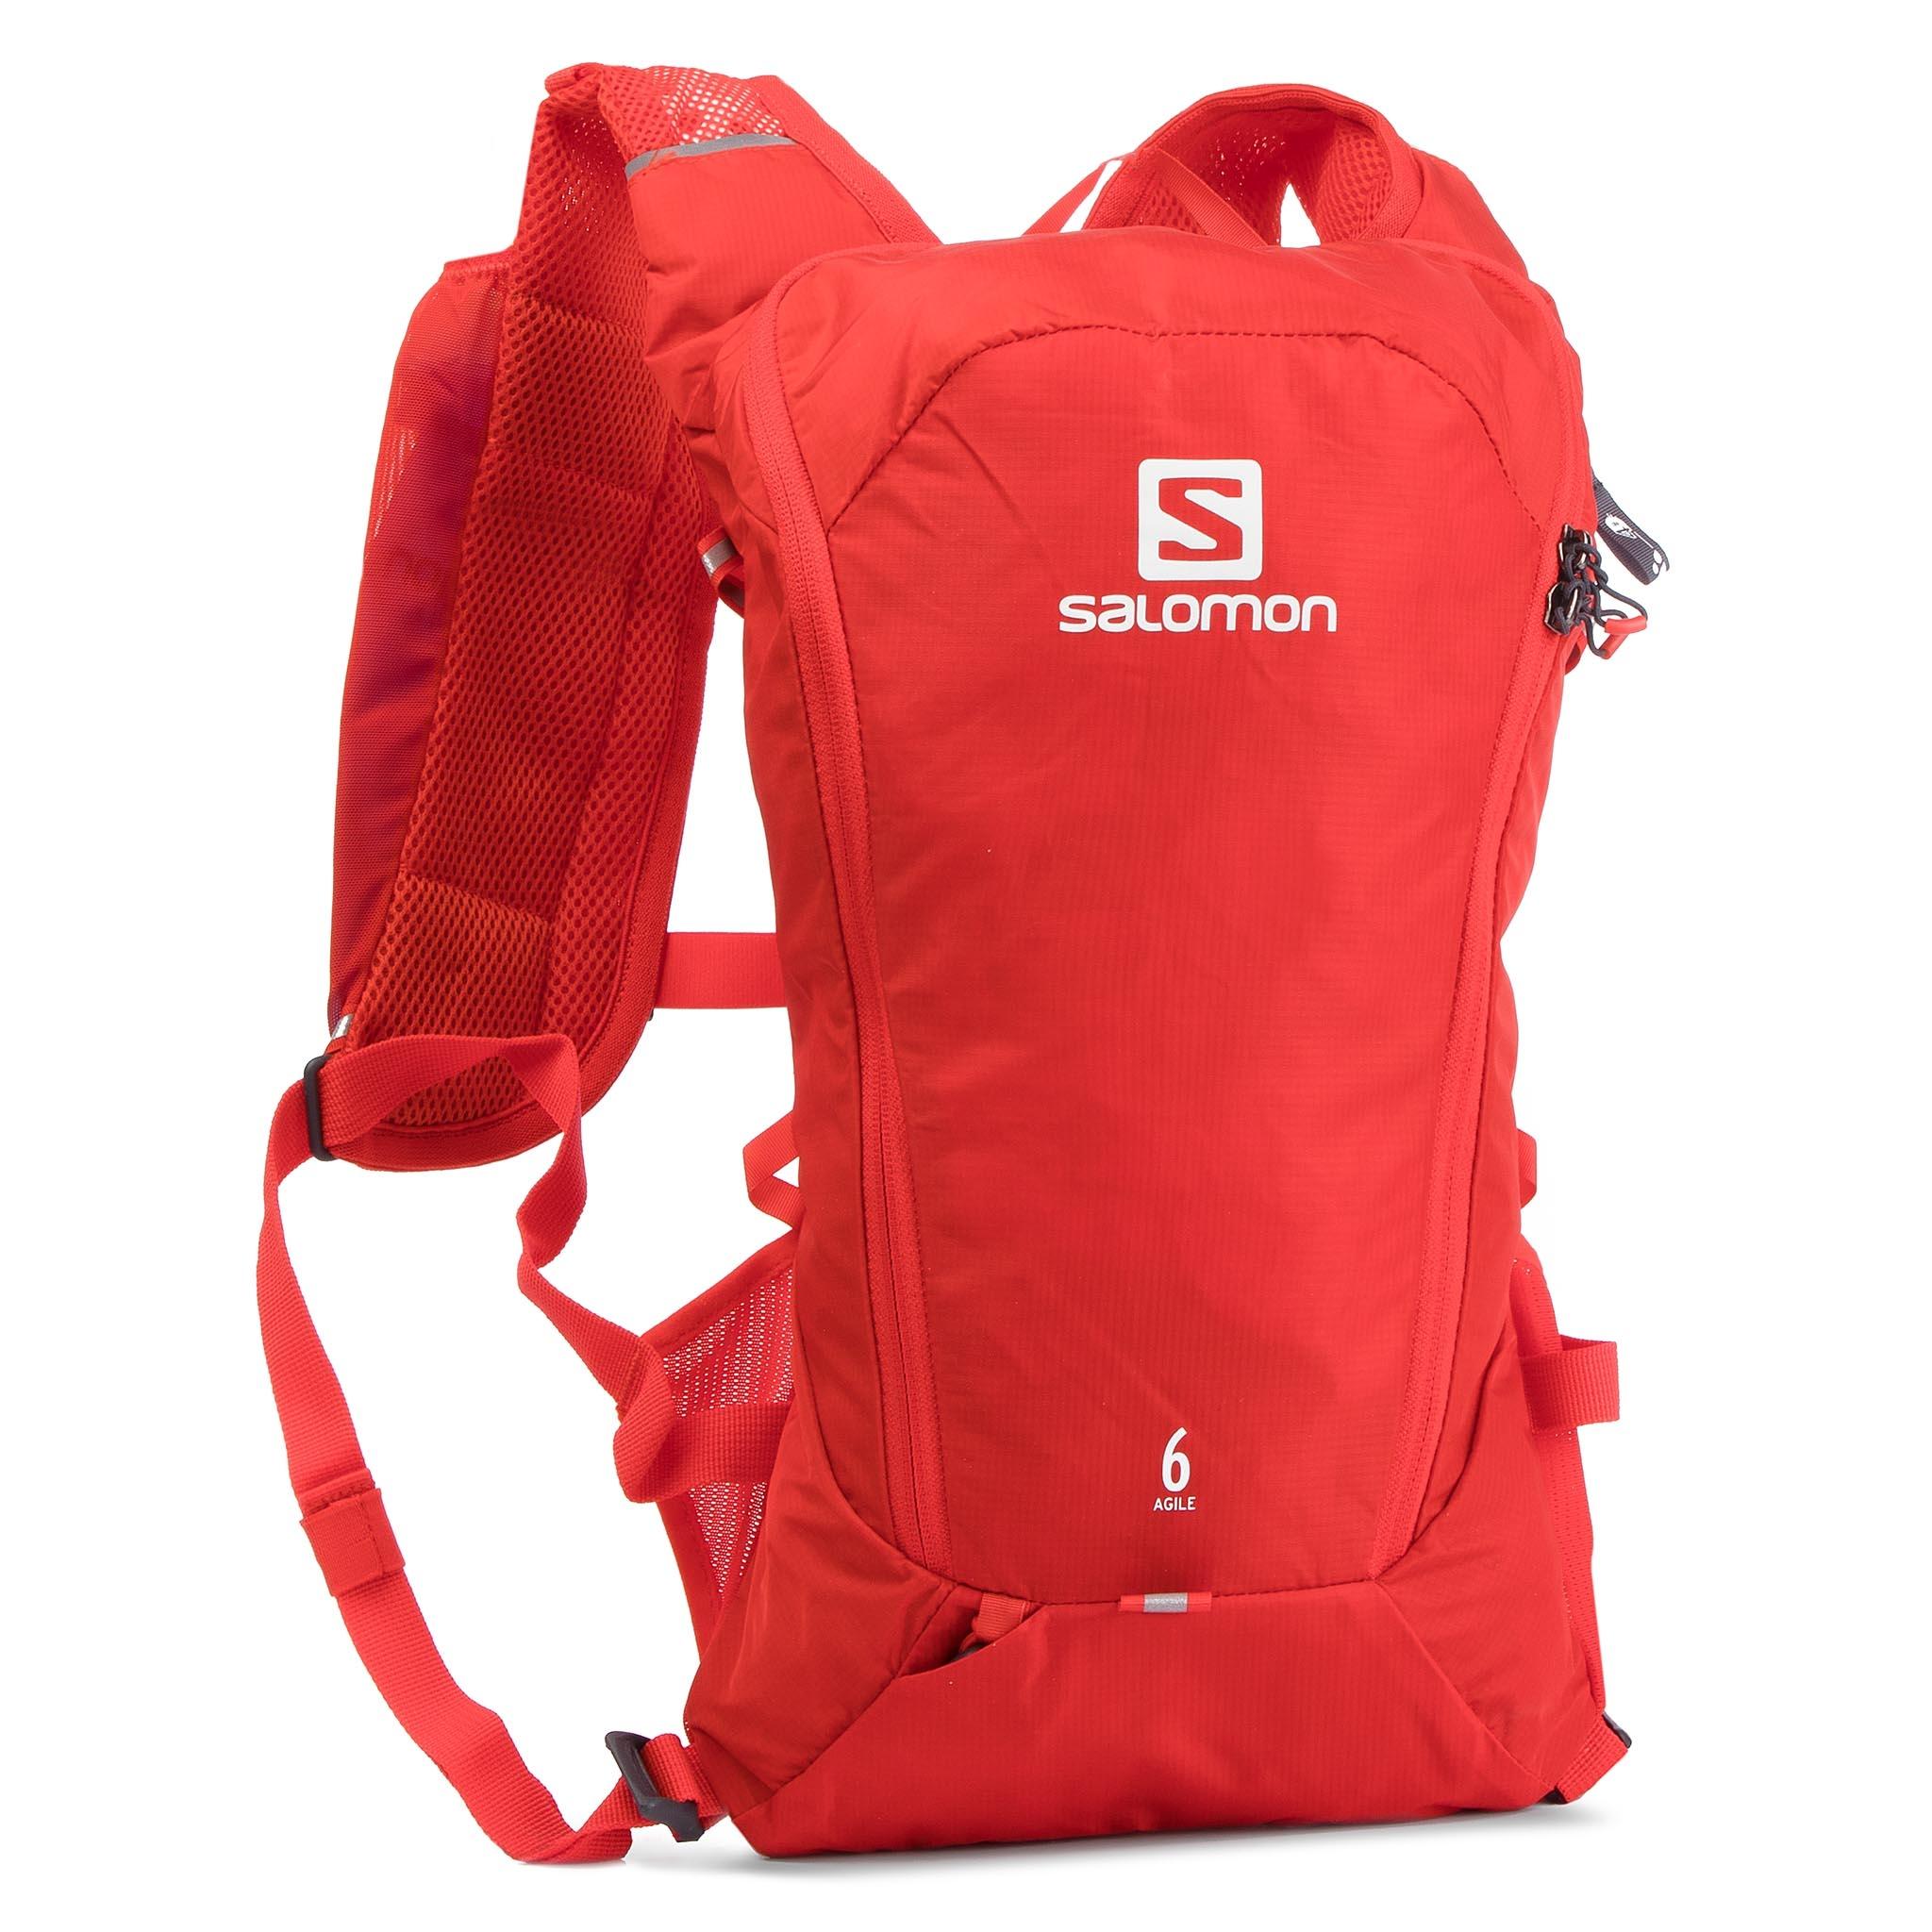 08cf1f9f9b Backpack SALOMON - Trailblazer 30 C10843 01 V0 Mediterranea - Sports ...